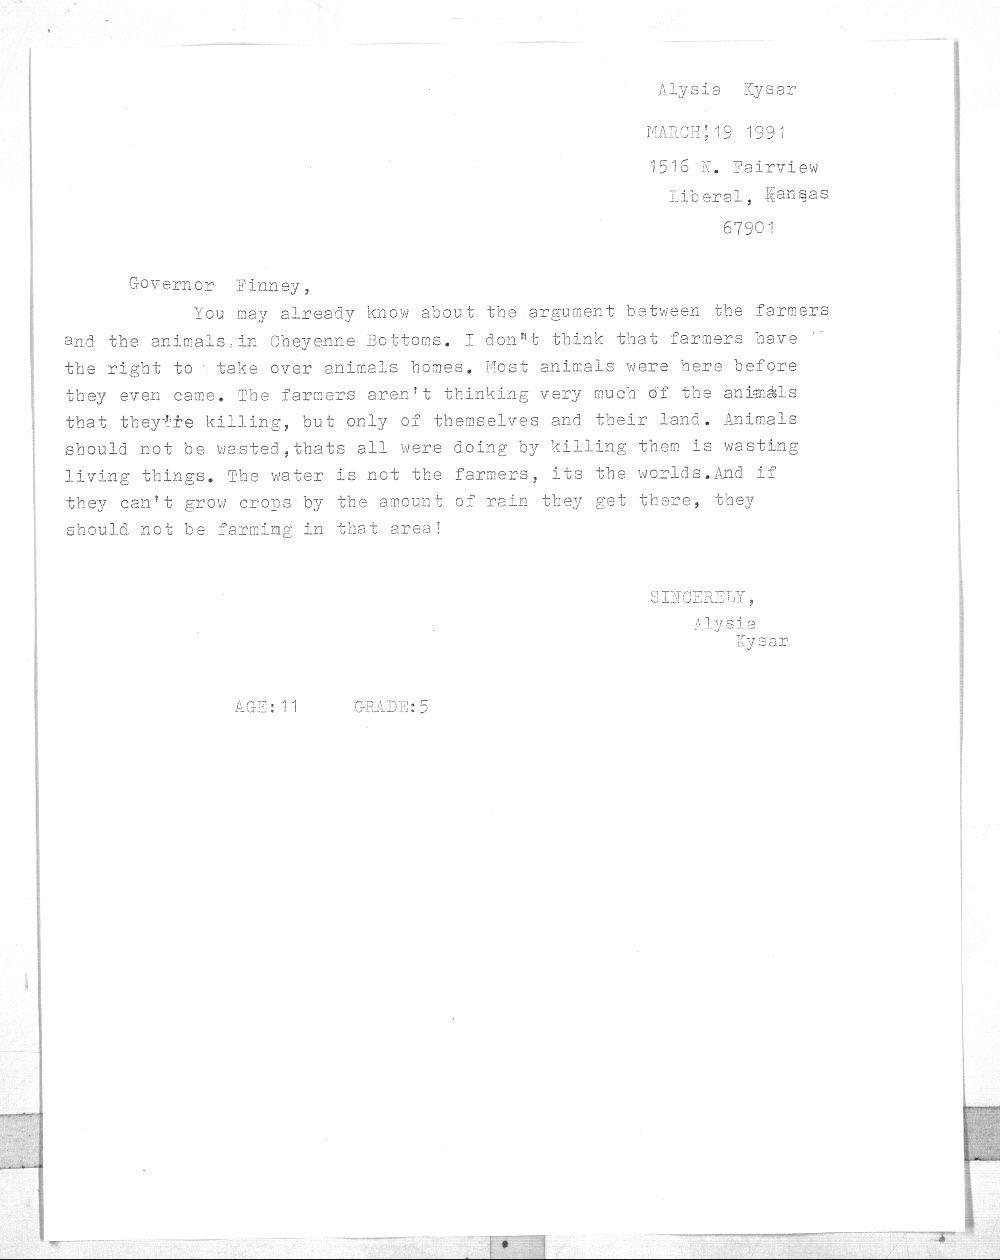 Alysia Kysar to Governor Joan Finney